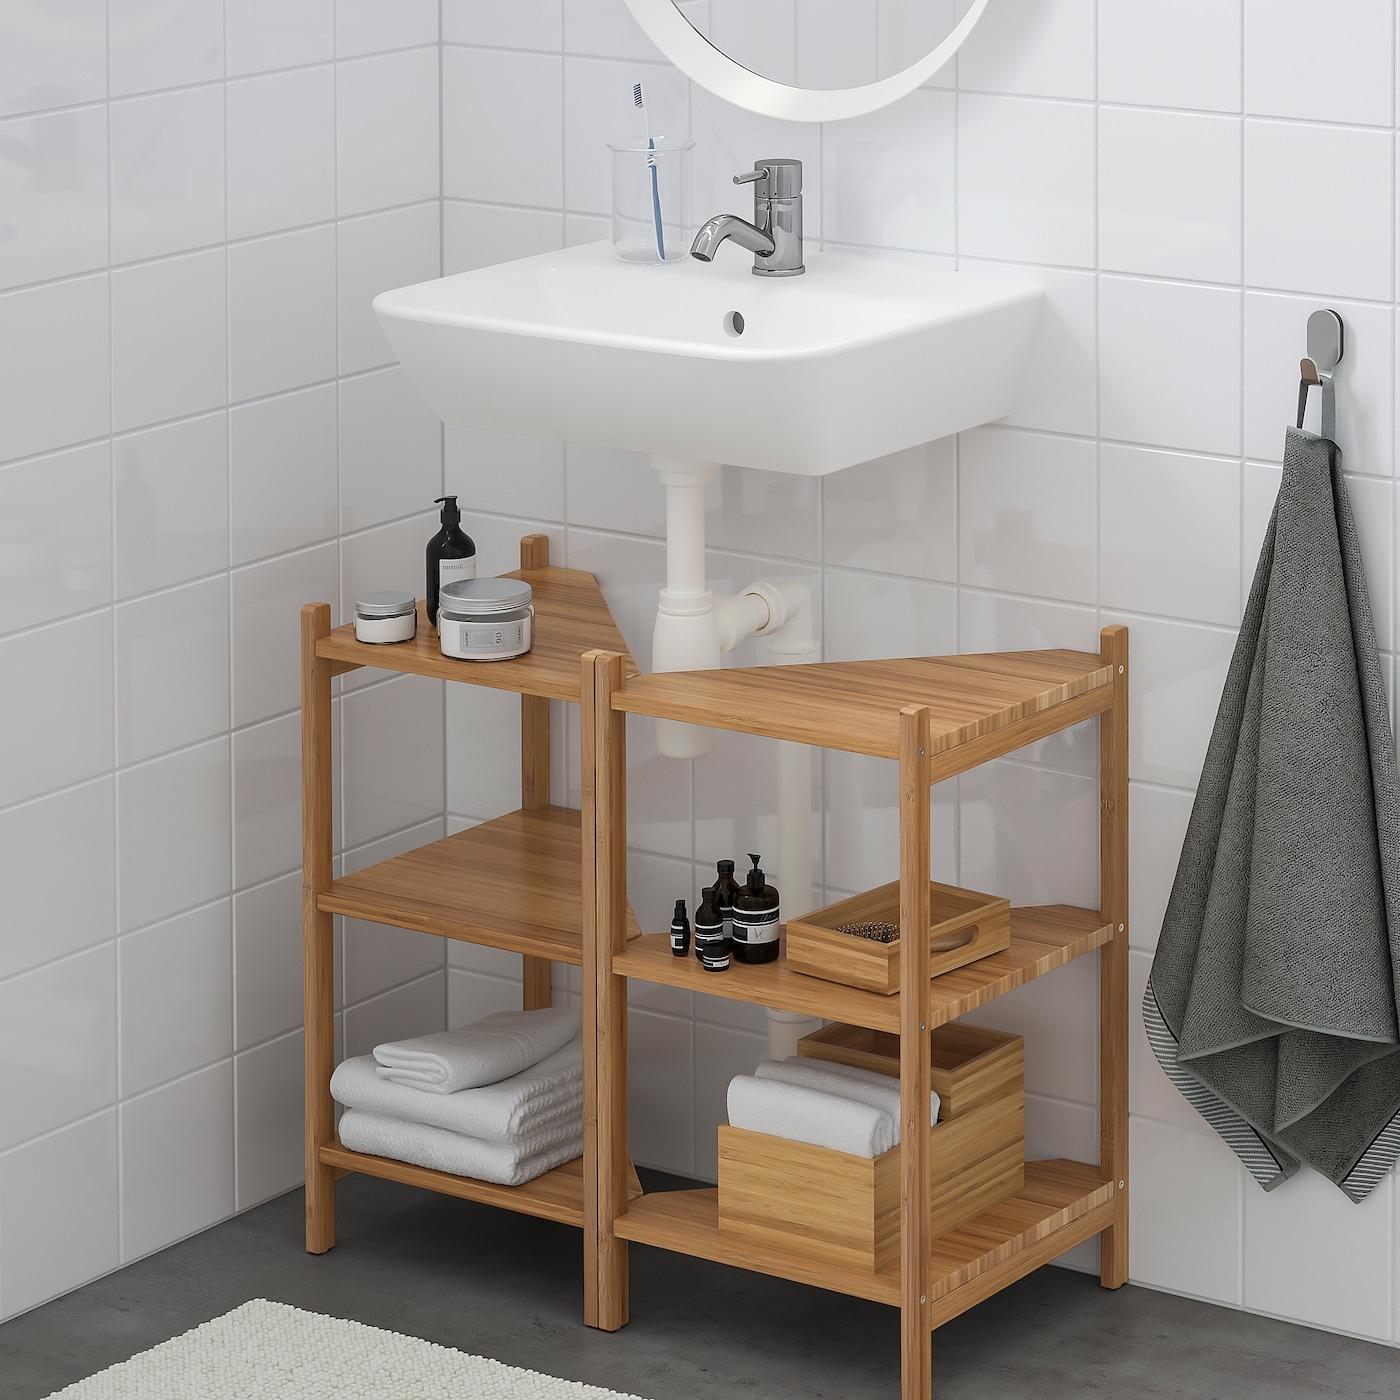 Rågrund Tyngen Sink Shelf Corner Shelf Bamboo Pilkån Faucet Ikea